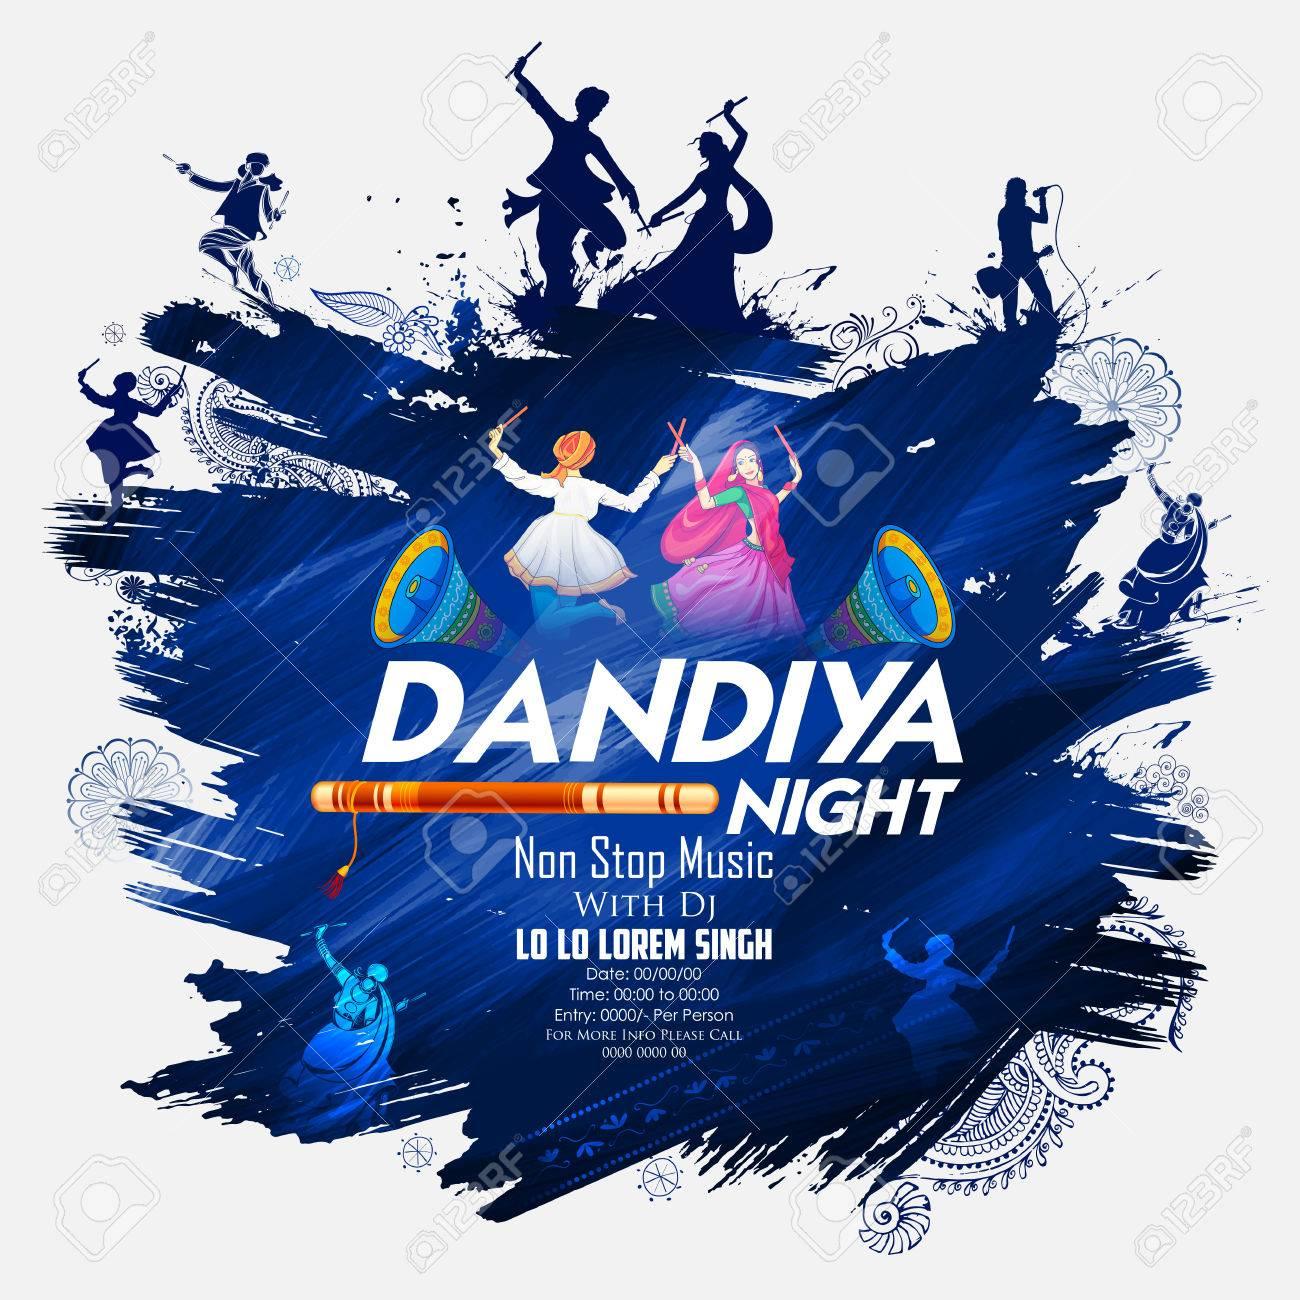 Couple playing Dandiya in disco, Garba Night poster - 86158407